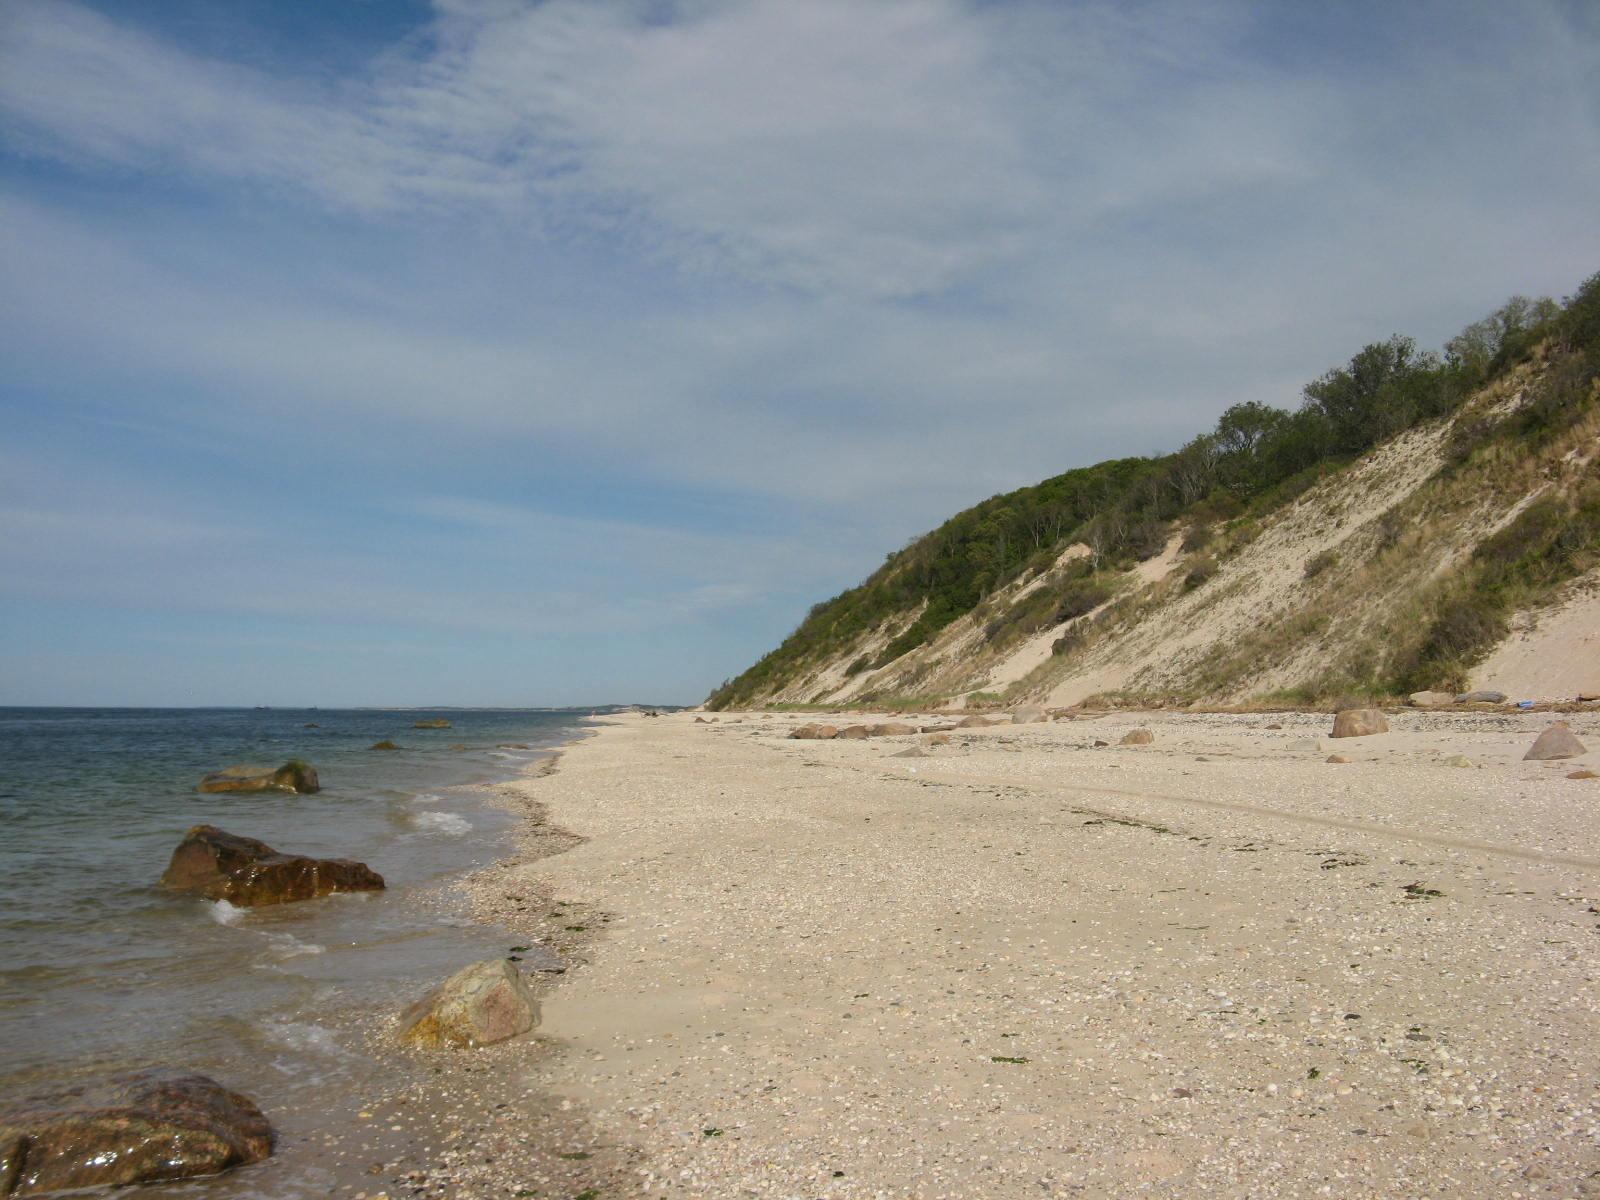 beach3may7_10.jpg